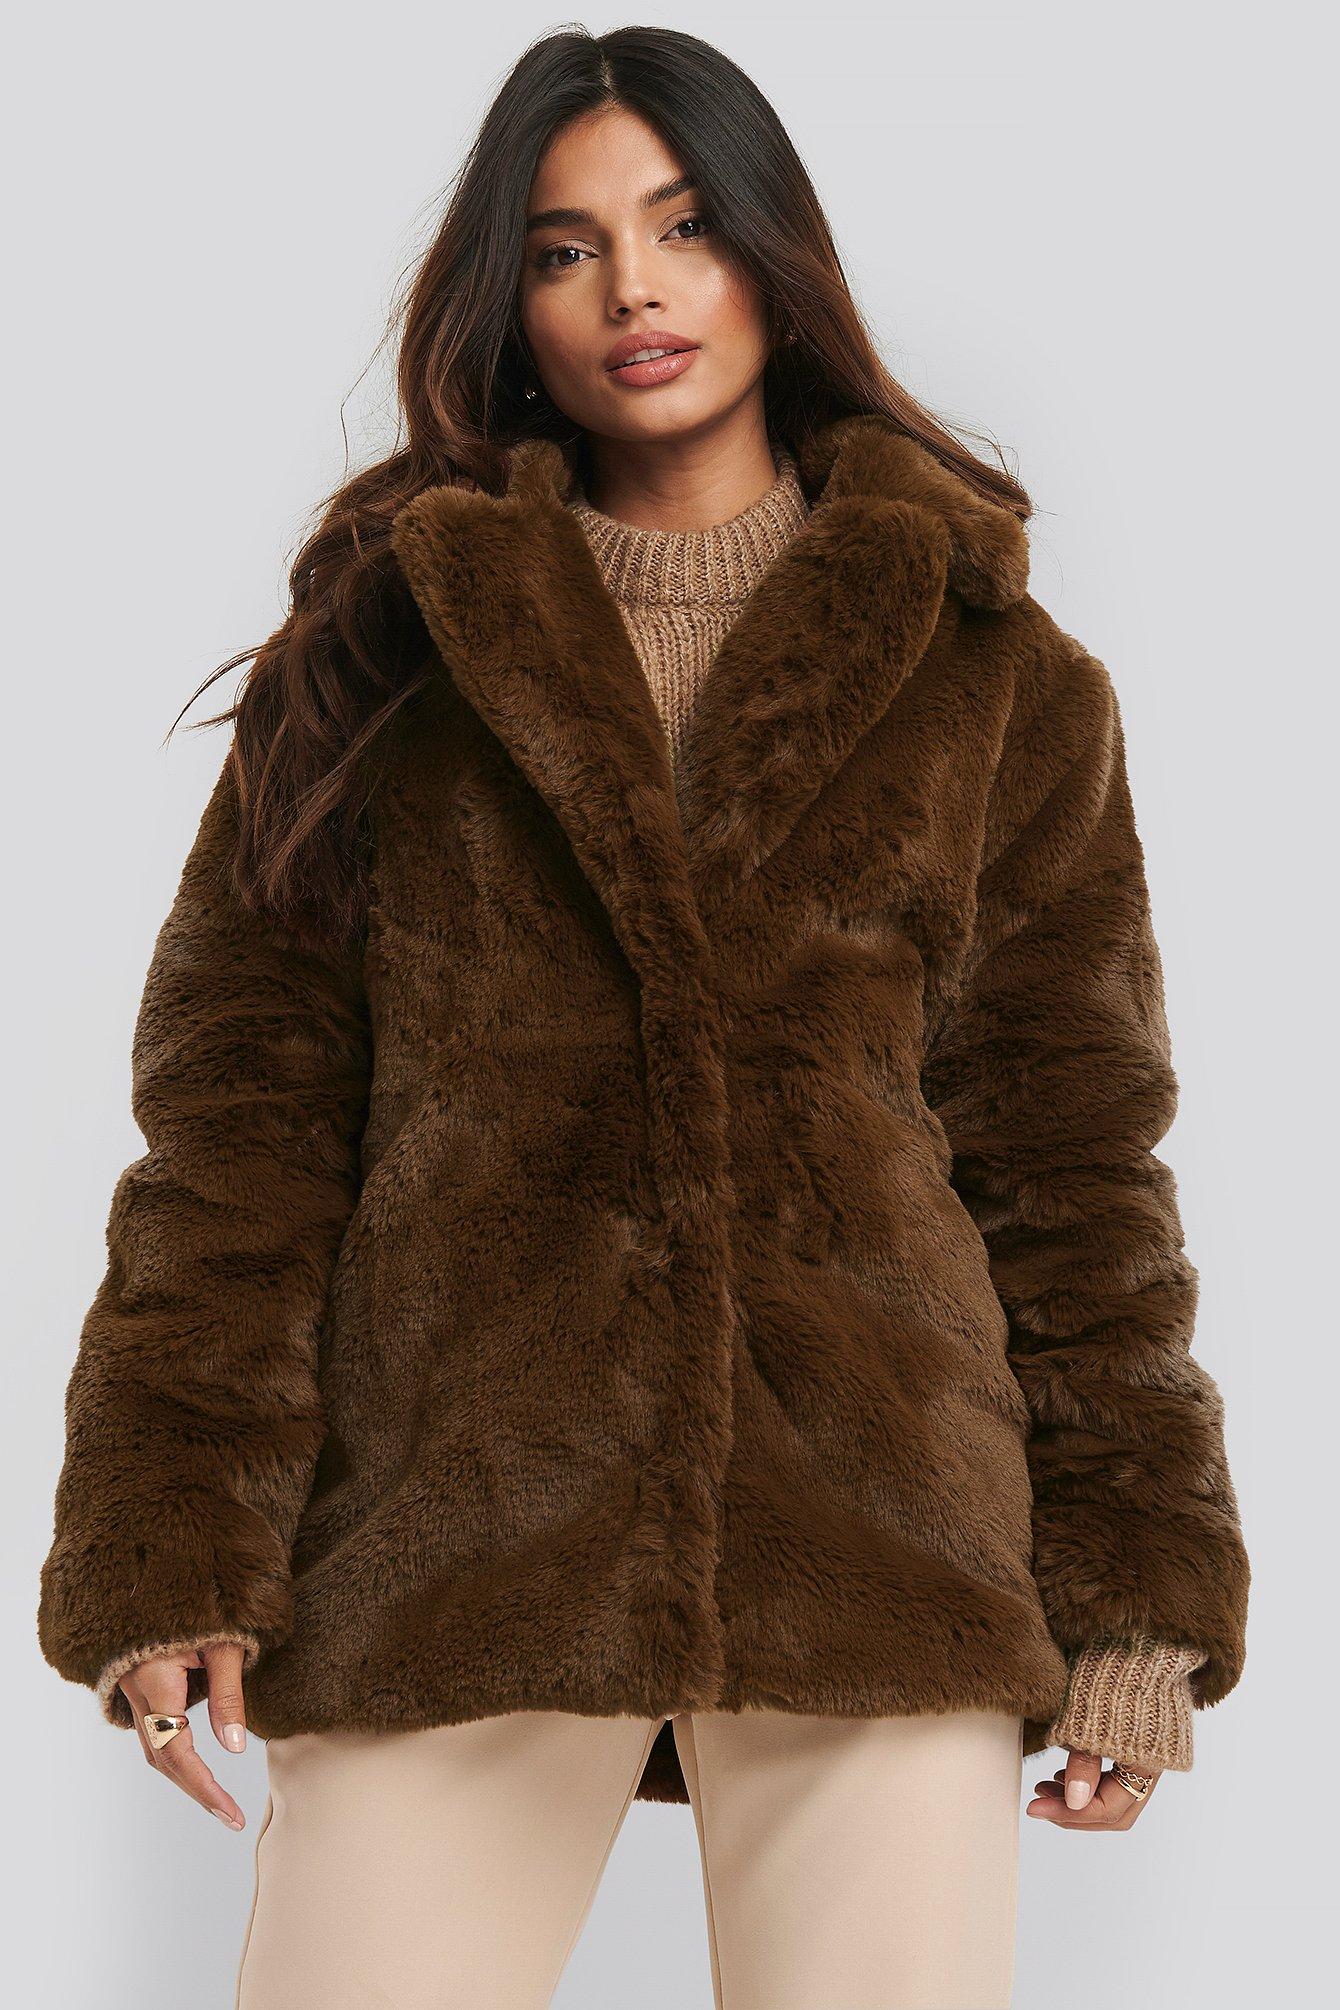 dilara x na-kd -  Soft Faux Fur Jacket - Brown